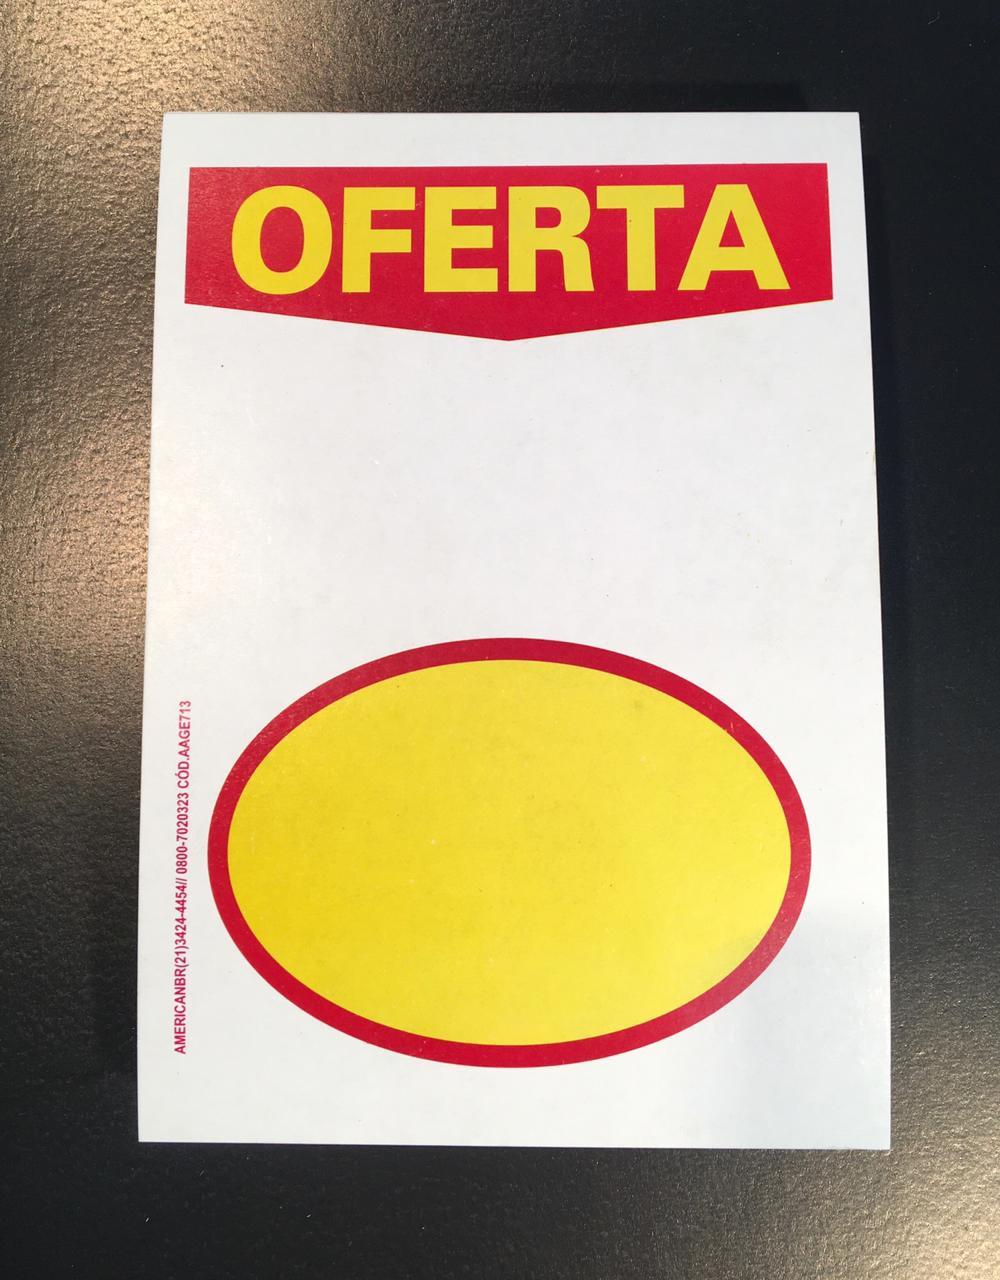 CARTAZ OFERTA COM ELIPSE 40X60 (C/ 50 UNIDADES)